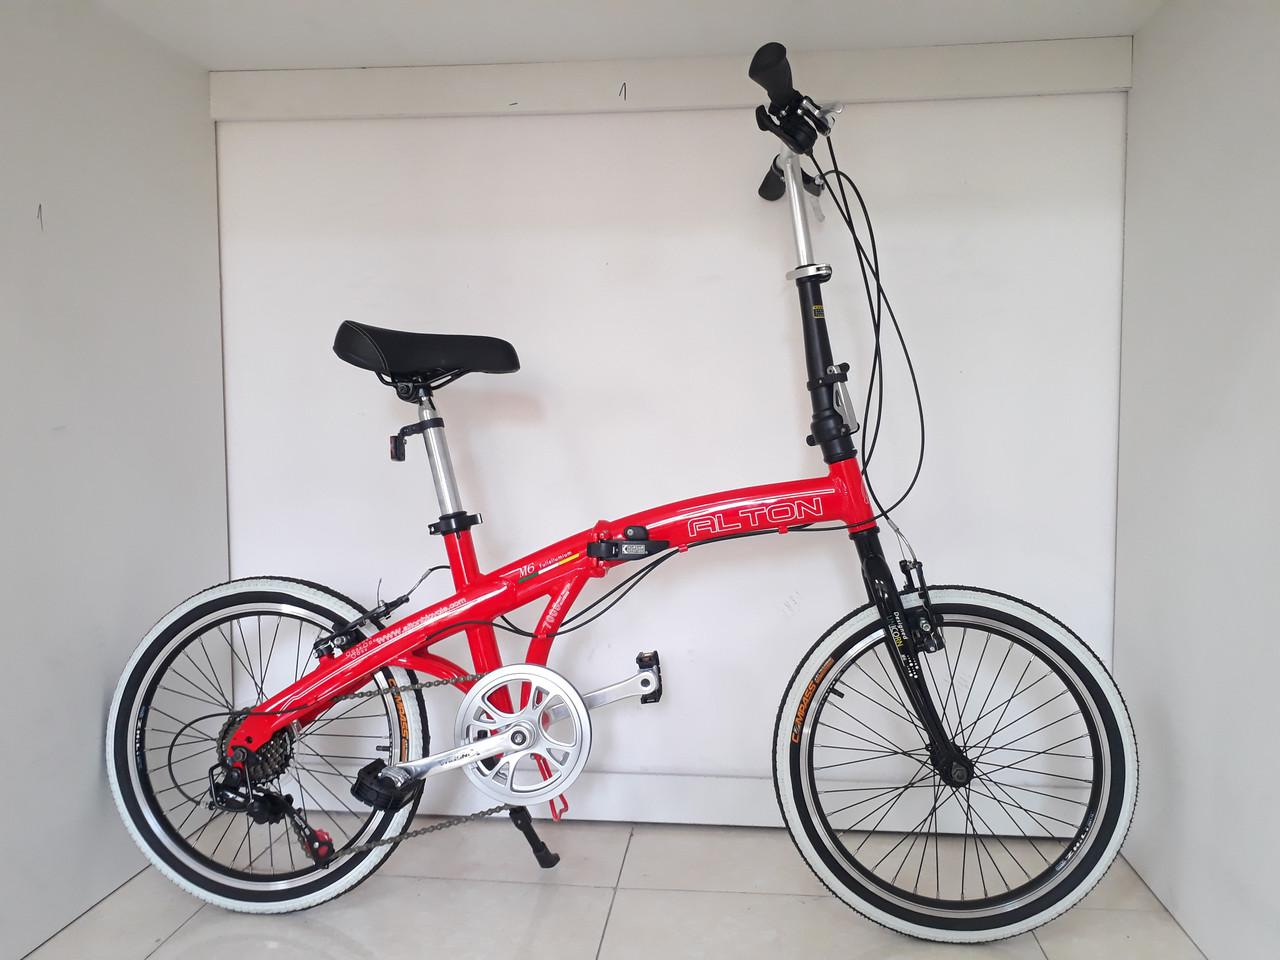 Складной легкий велосипед Alton на 20-х колесах со скоростями